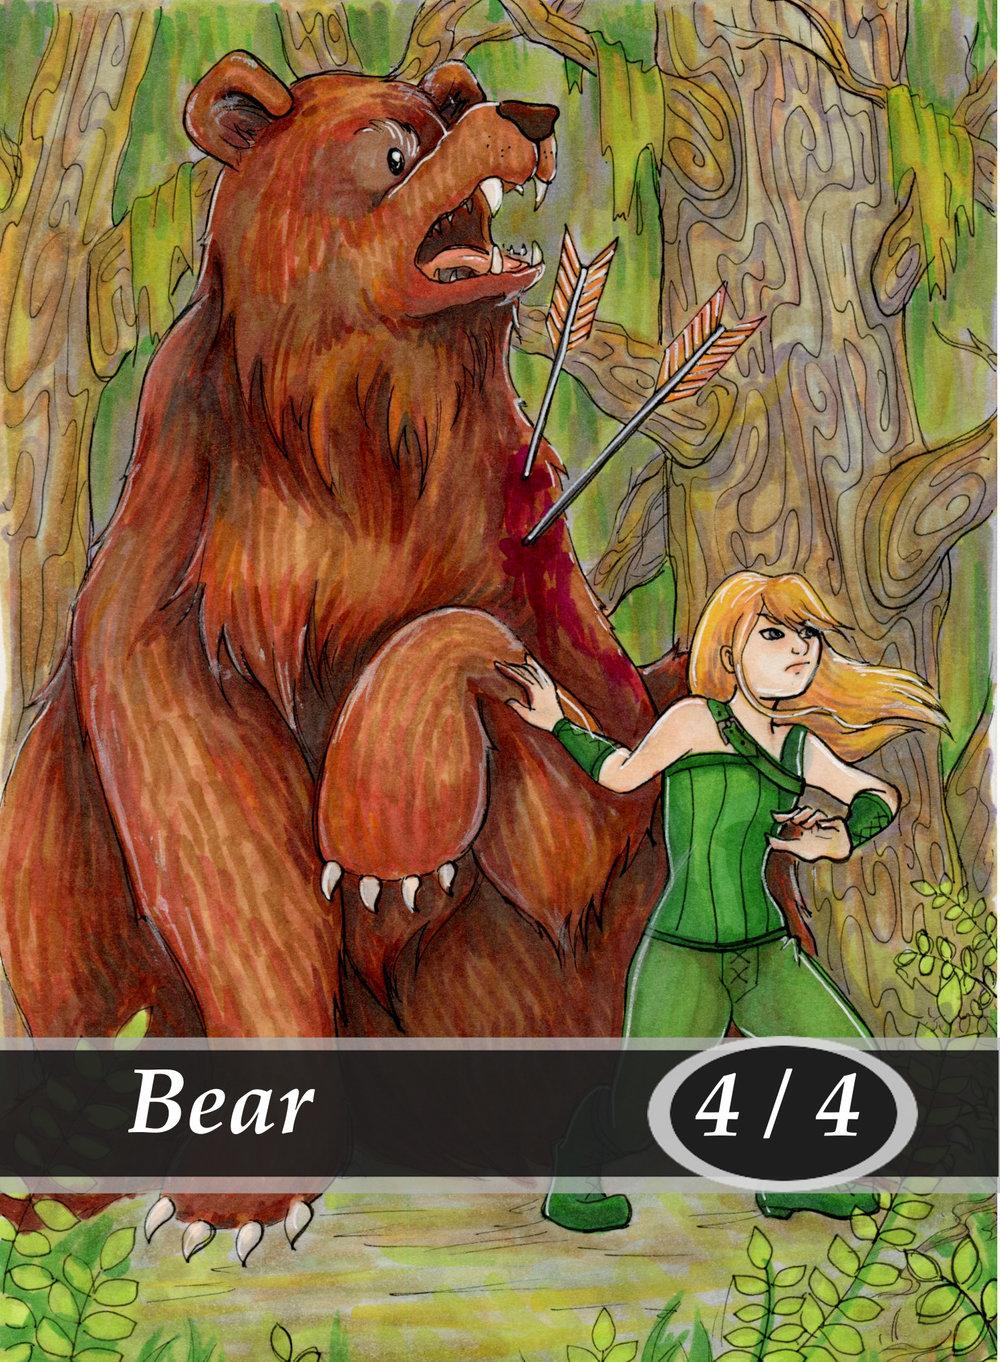 Bear Magic the Gathering MTG Token by Anna Van Skike with AnnaVSart